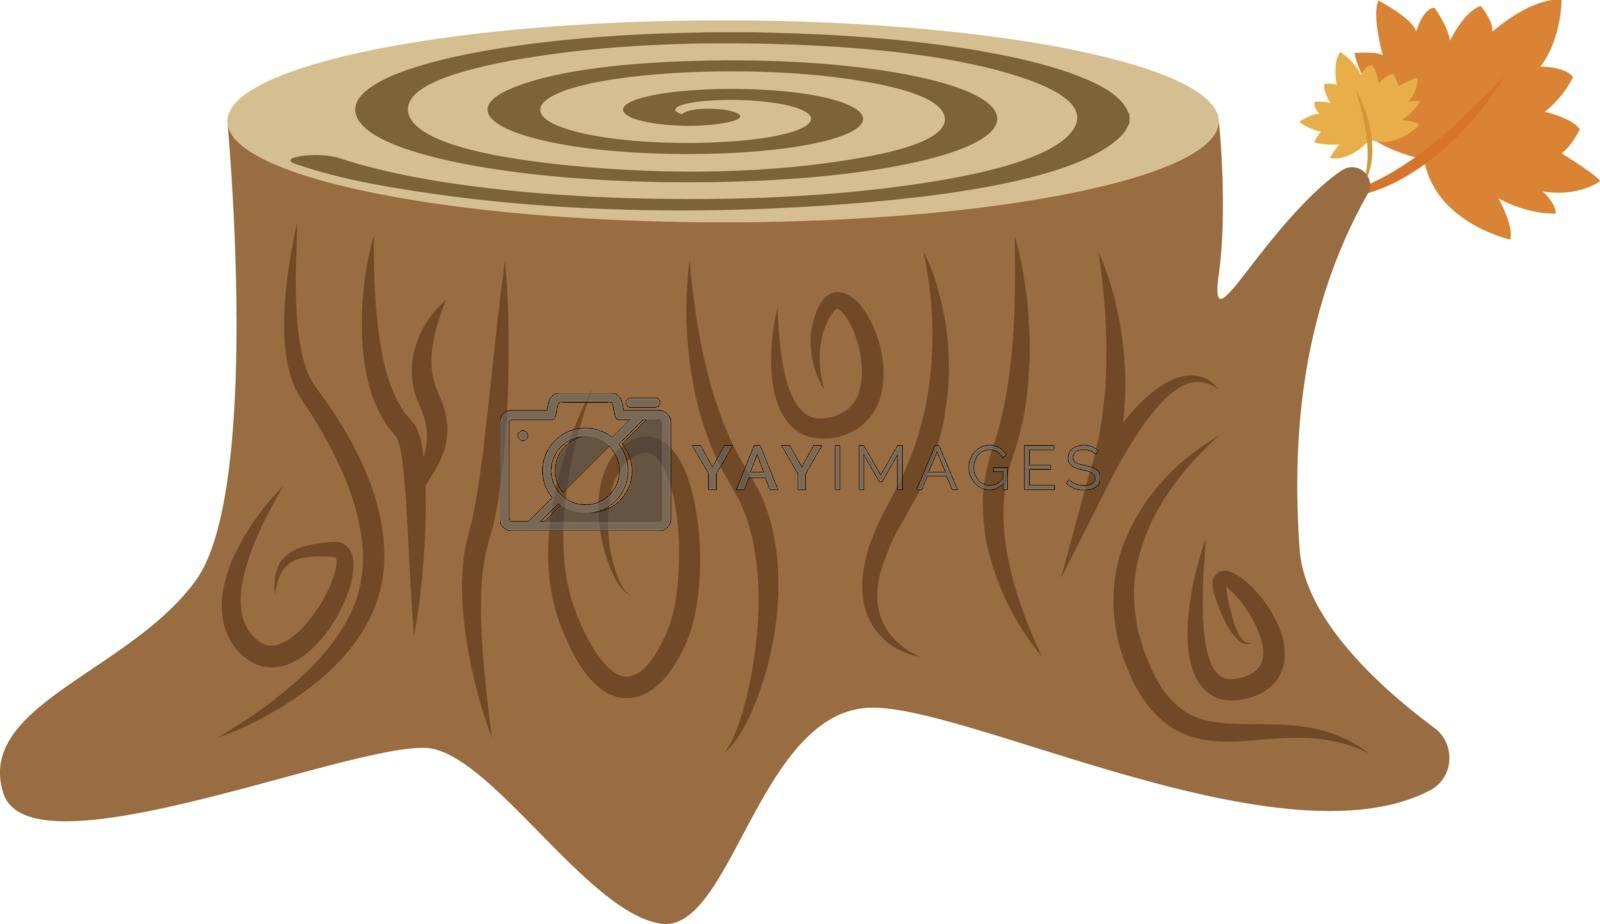 Wooden log, illustration, vector on white background.